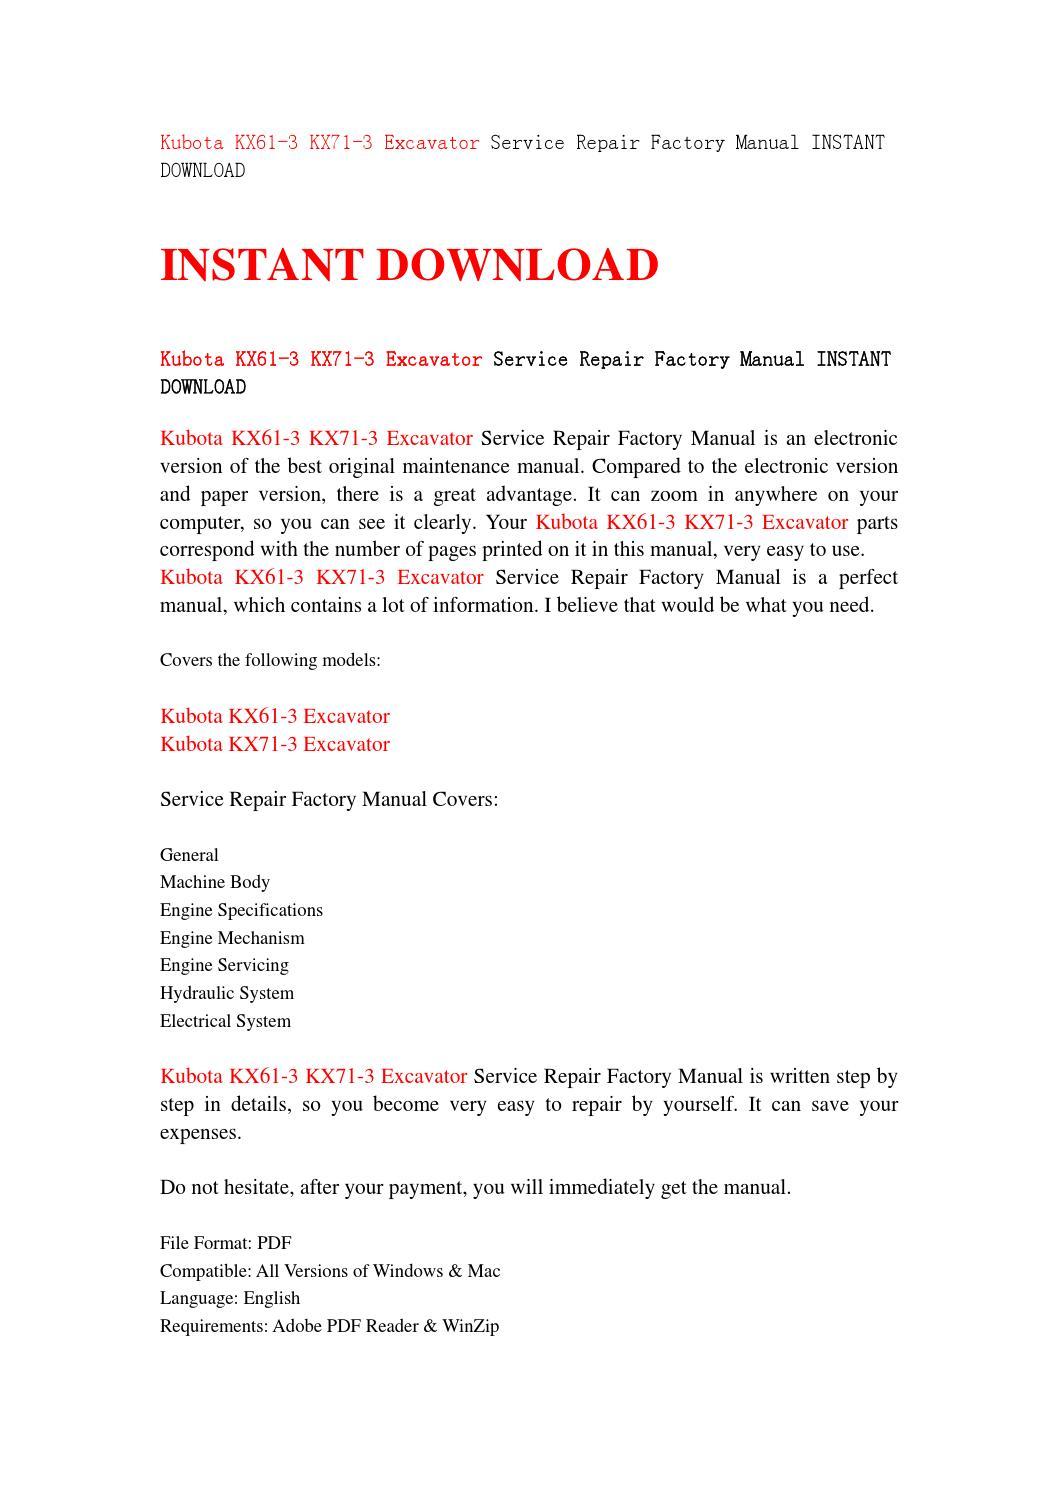 Kubota kx61 3 kx71 3 excavator service repair factory manual instant  download by jsjhefnjn - issuu